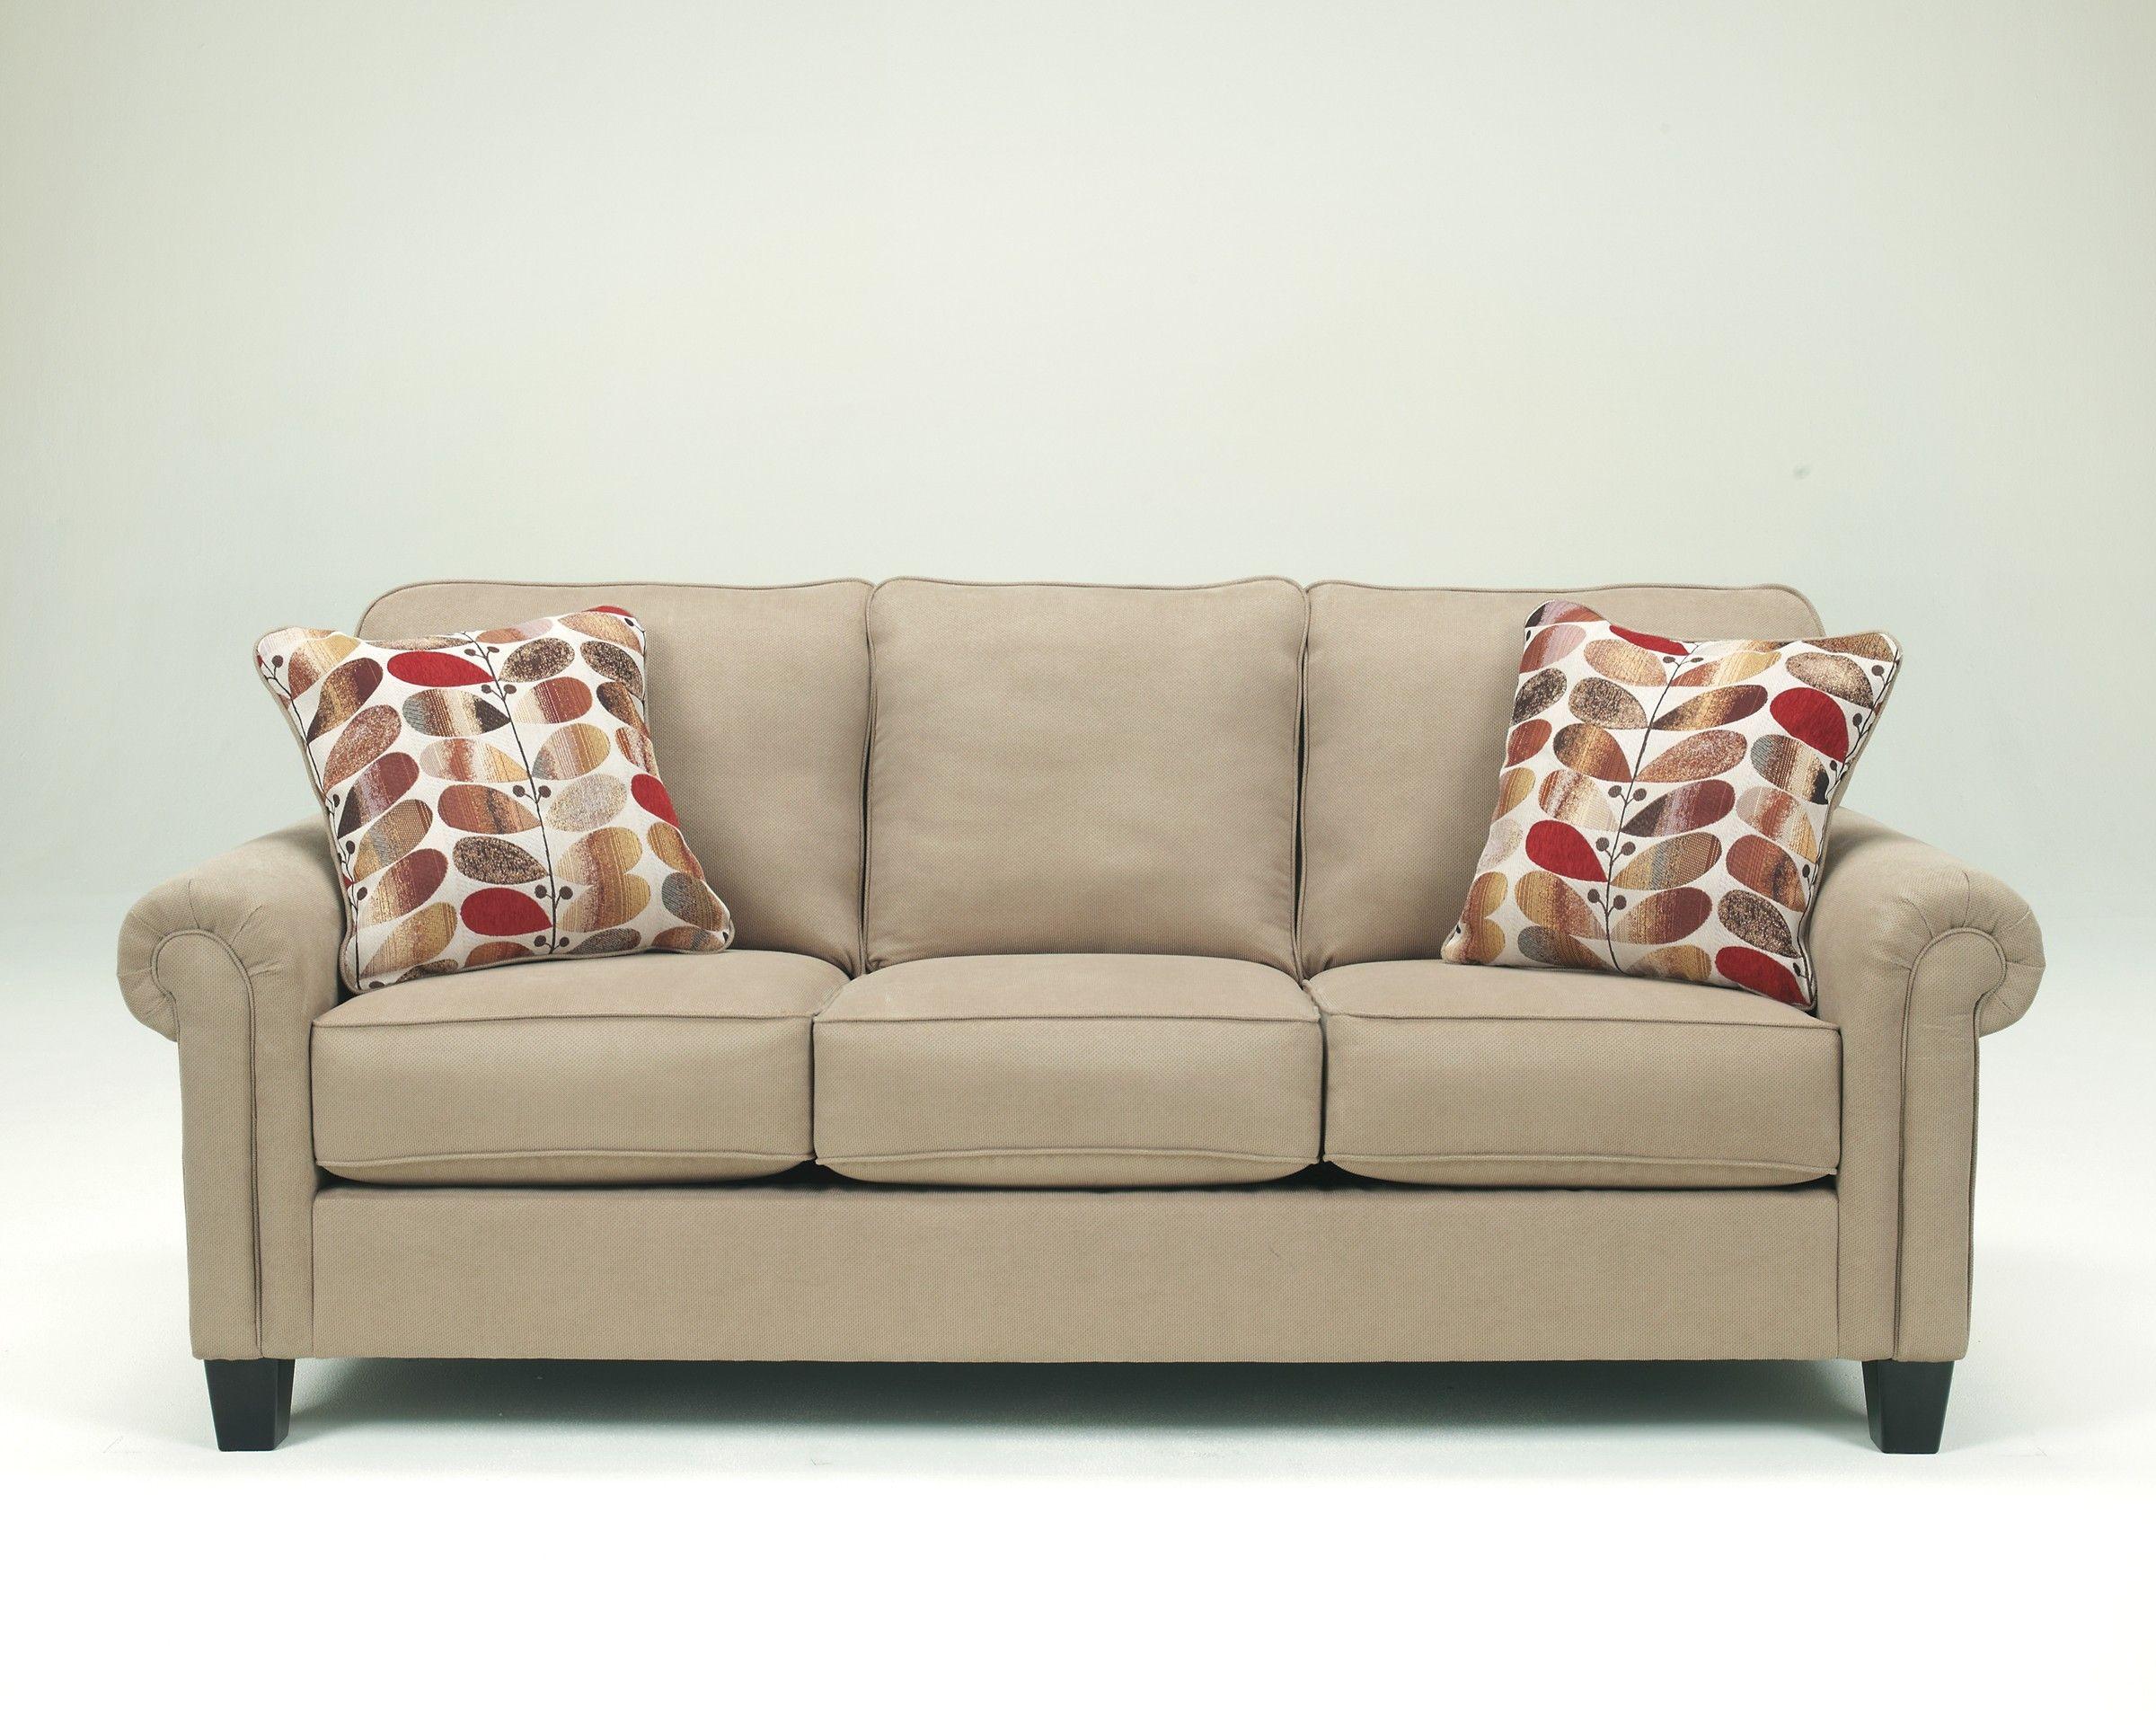 Ashley Ekron 7980038 Benchcraft Sofa Sofa Store Furniture Sofa